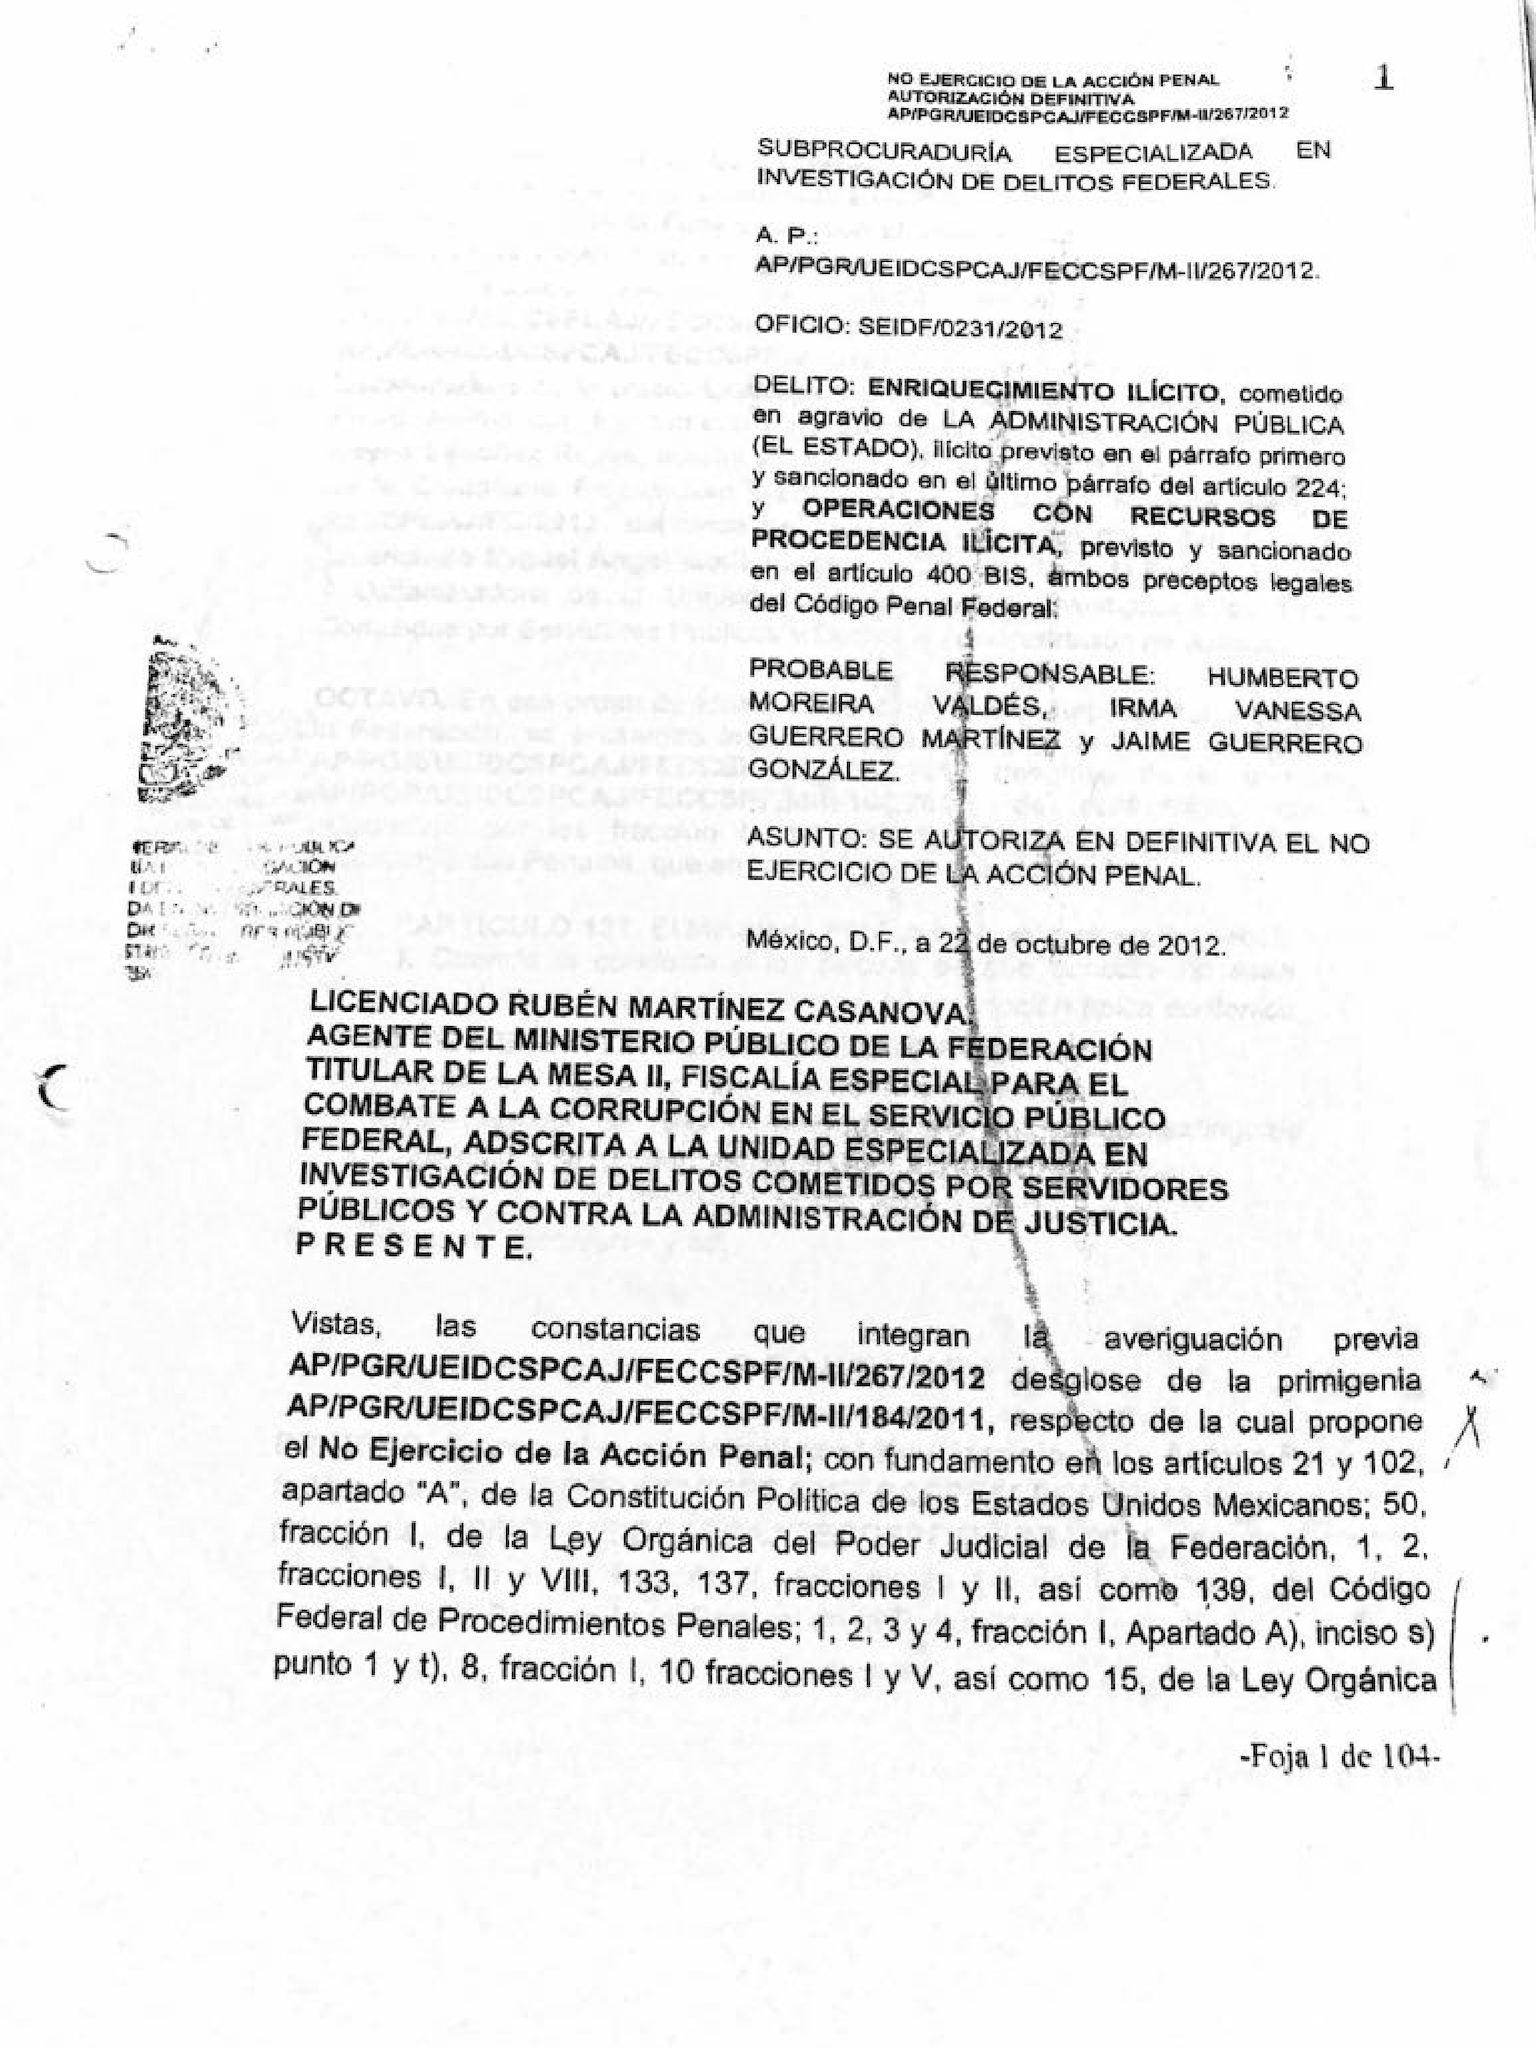 Exoneracion Humberto Moreira